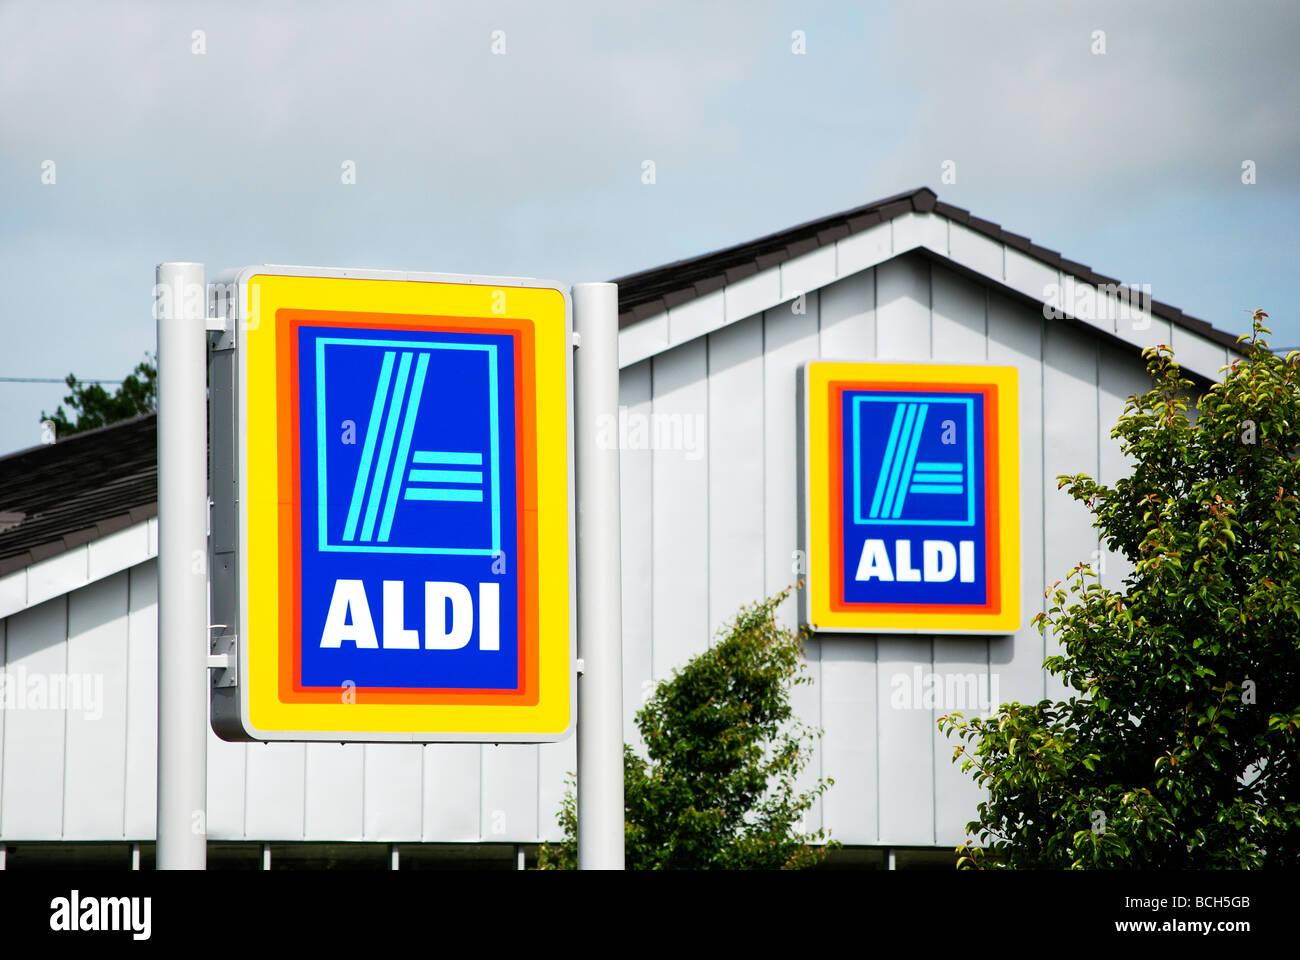 Aldi discount store in cornwall,uk Stock Photo